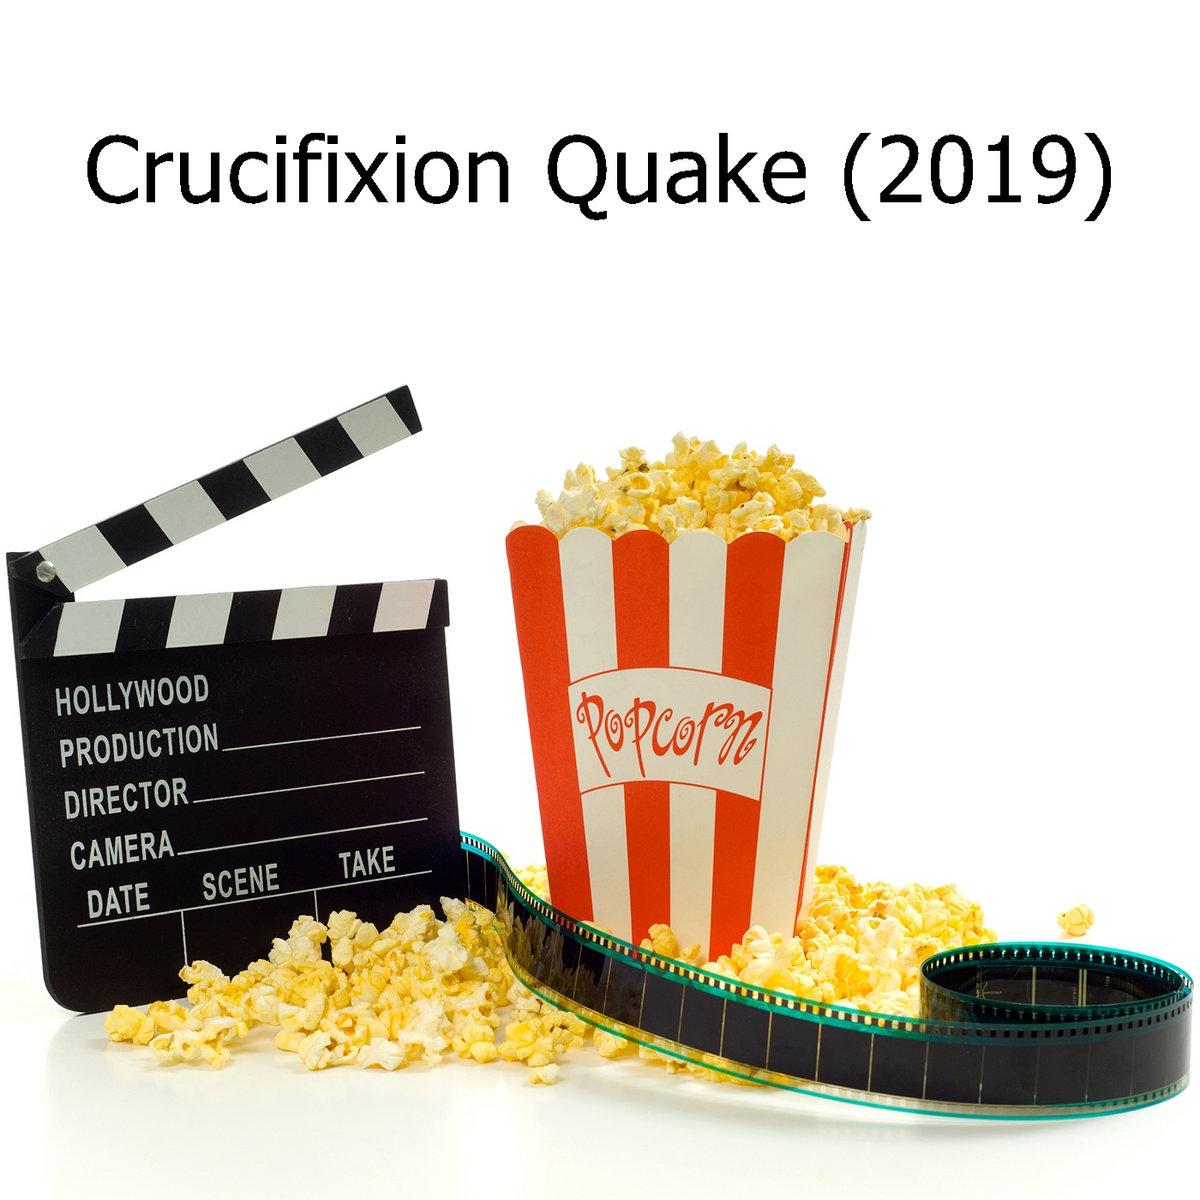 MOVIE REVIEW CRUCIFIXION QUAKE DOWNLOAD   tathehogobi